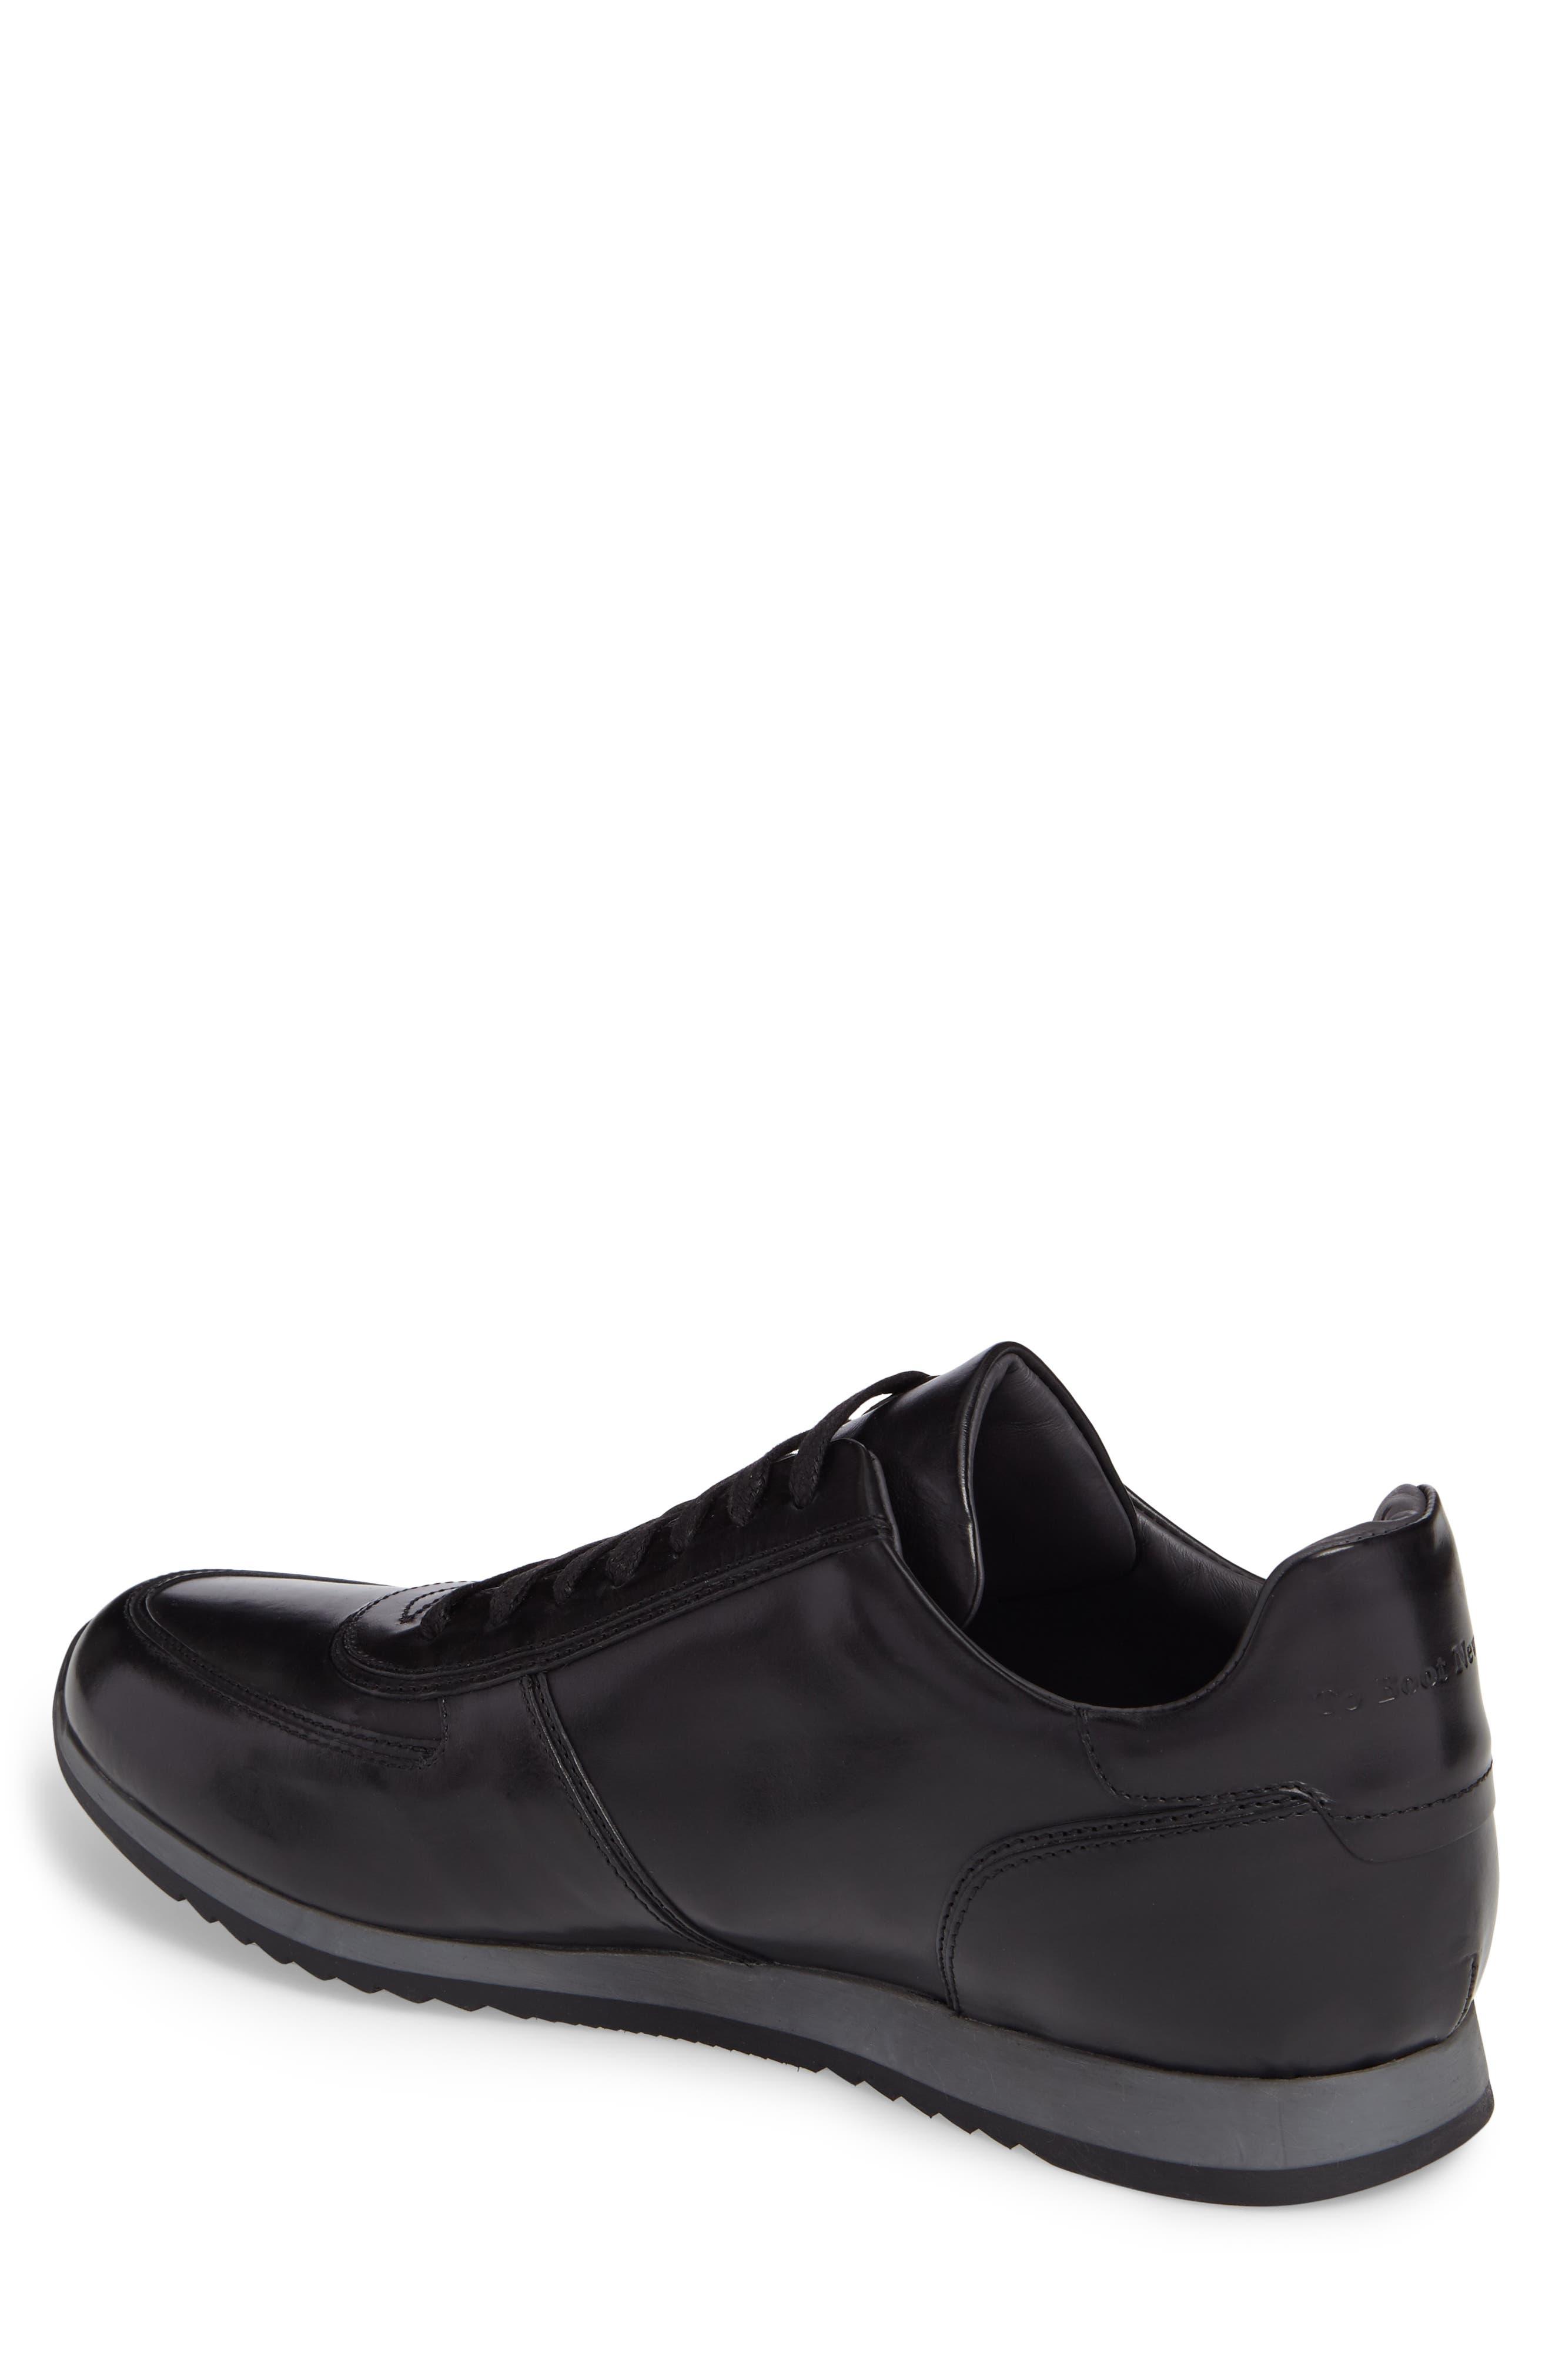 Hatton Sneaker,                             Alternate thumbnail 2, color,                             003